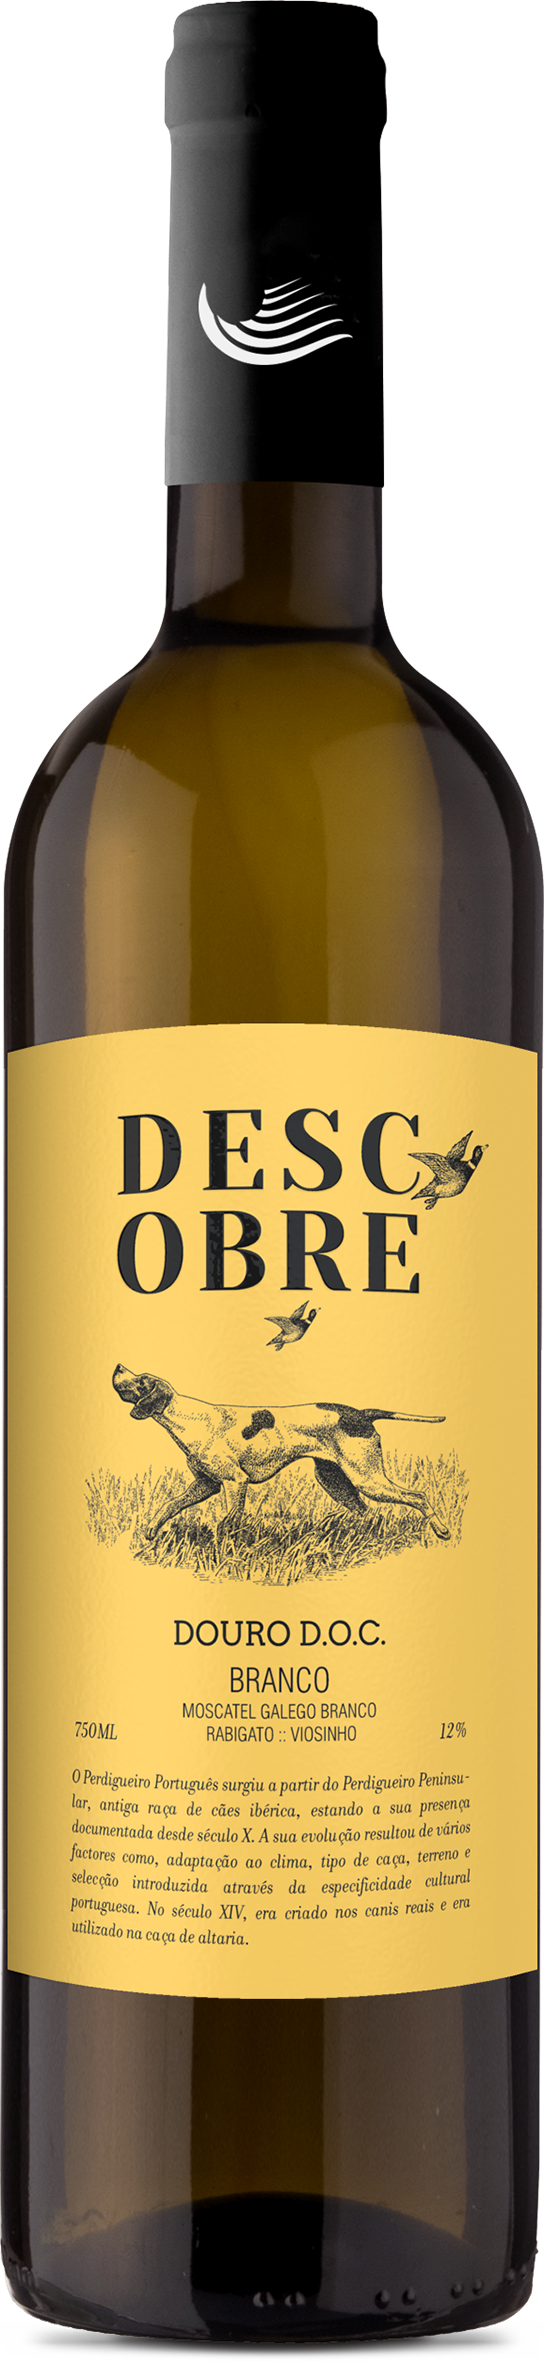 descobre-doc-douro-branco- image